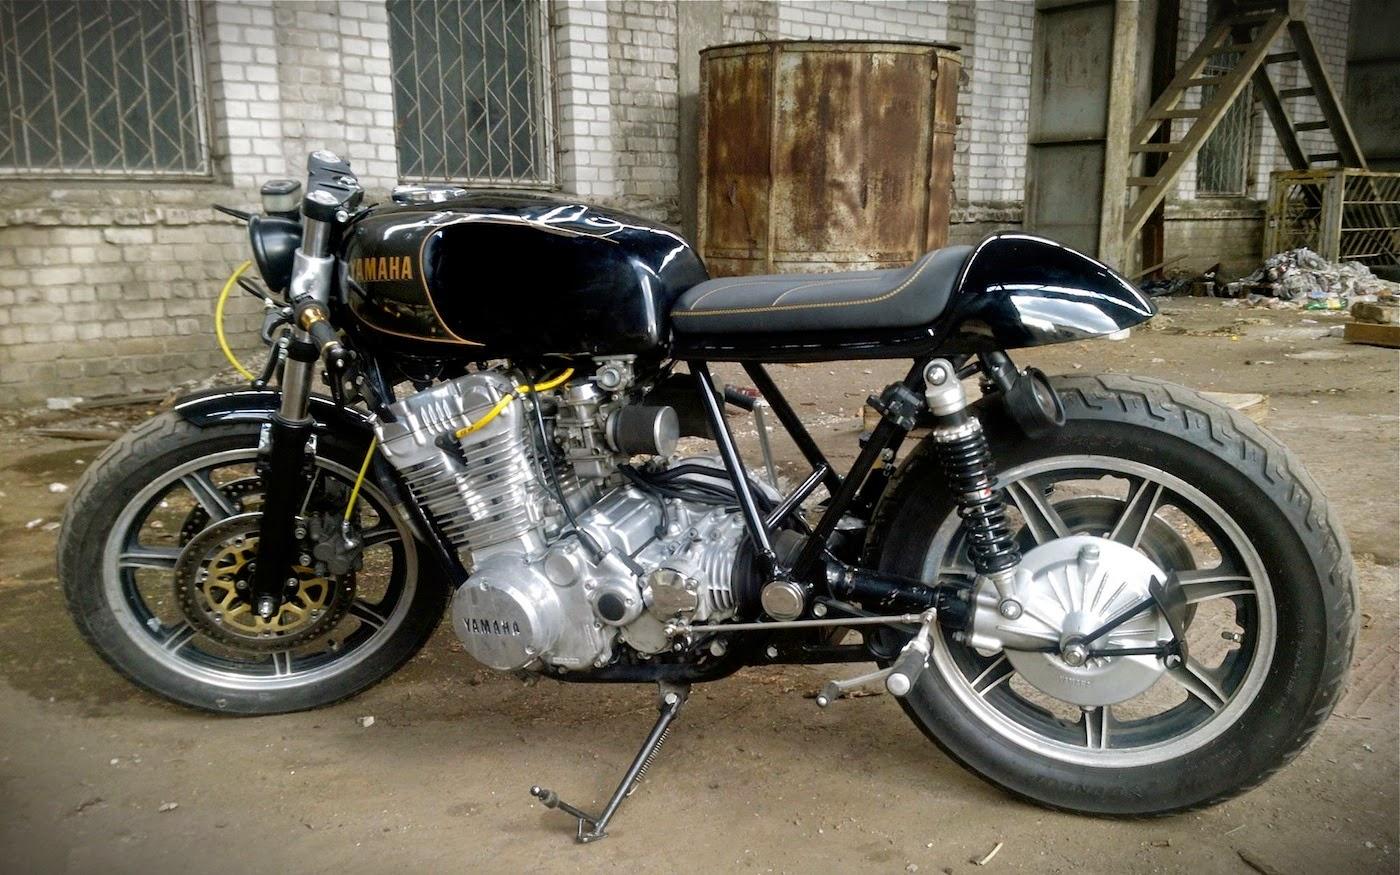 yamaha xs 750 triple cafe racer | 99garage | cafe racers customs